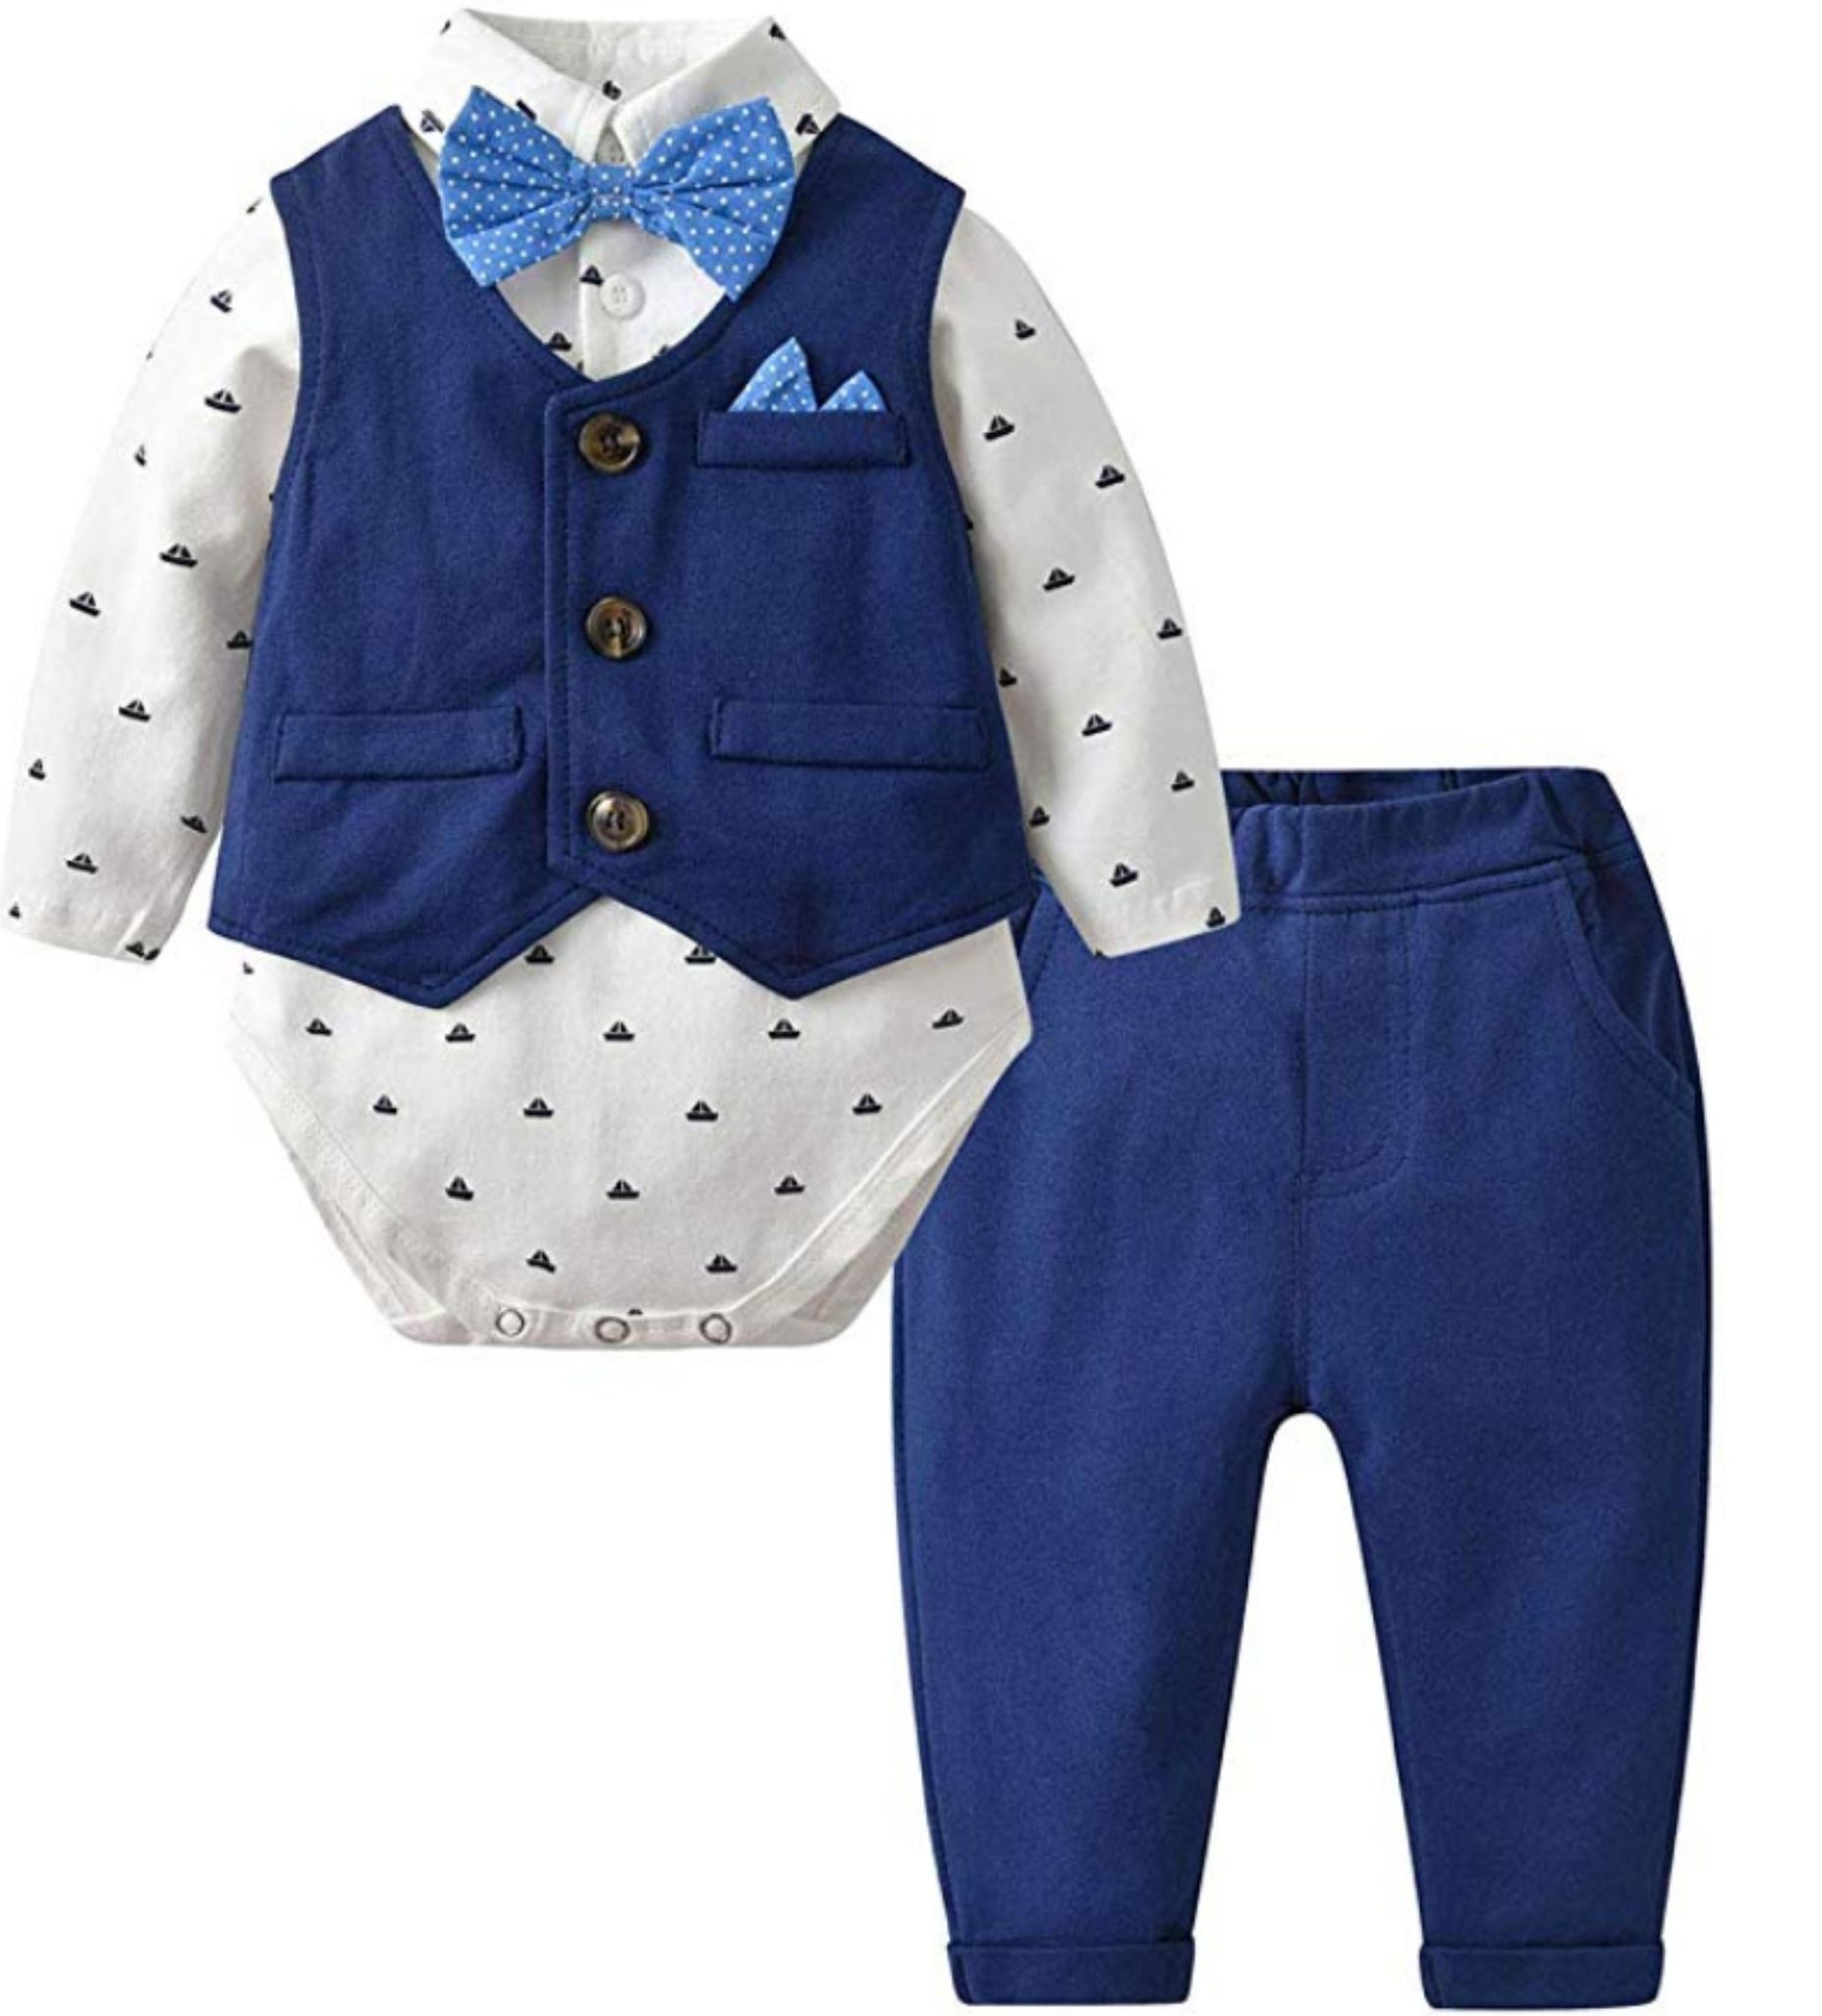 Famuka Baby Anzuge Baby Anzug Baby Junge Baby Anzug Baby Junge